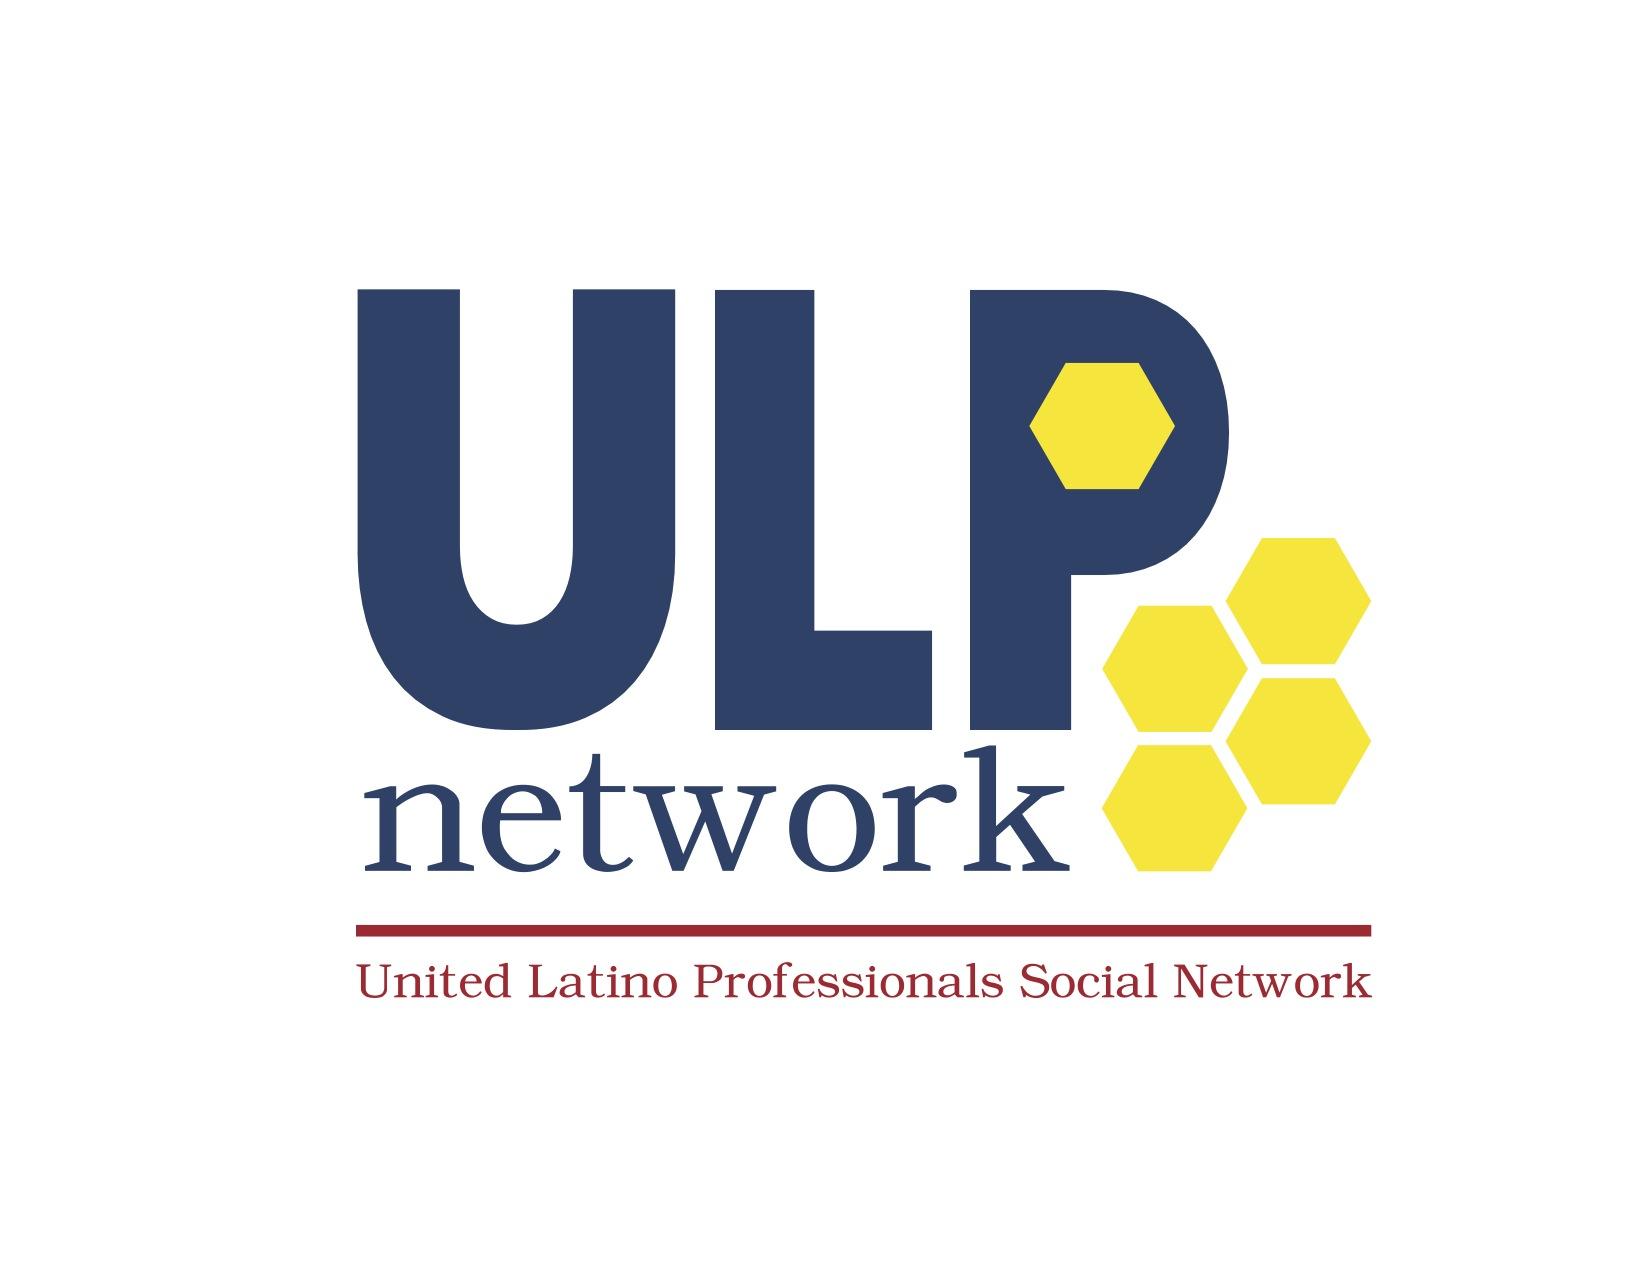 United Latino Professionals